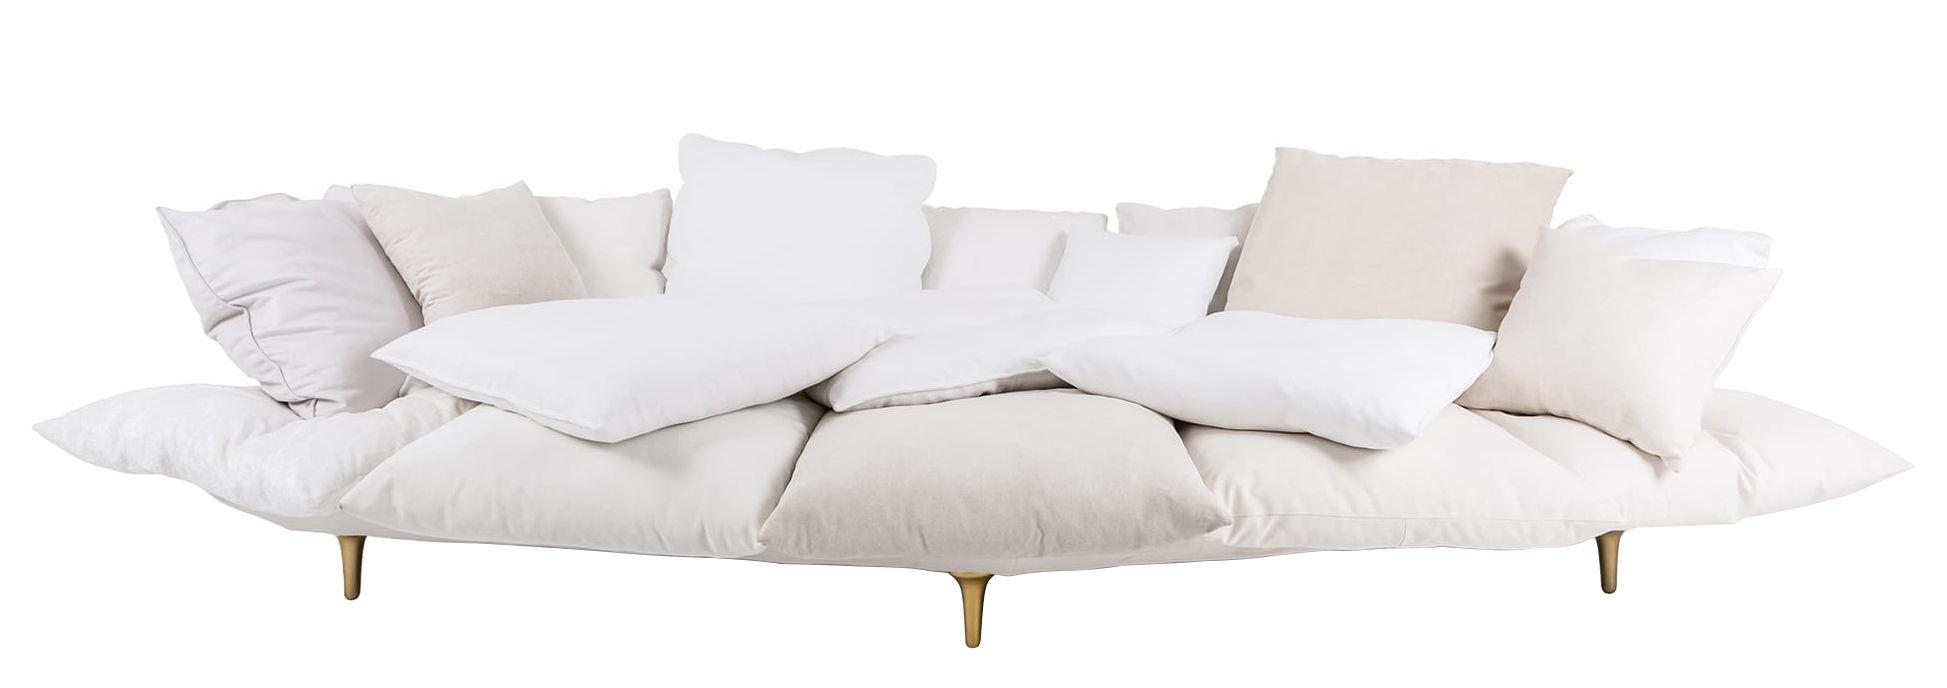 comfy l 300 cm seletti sofa. Black Bedroom Furniture Sets. Home Design Ideas